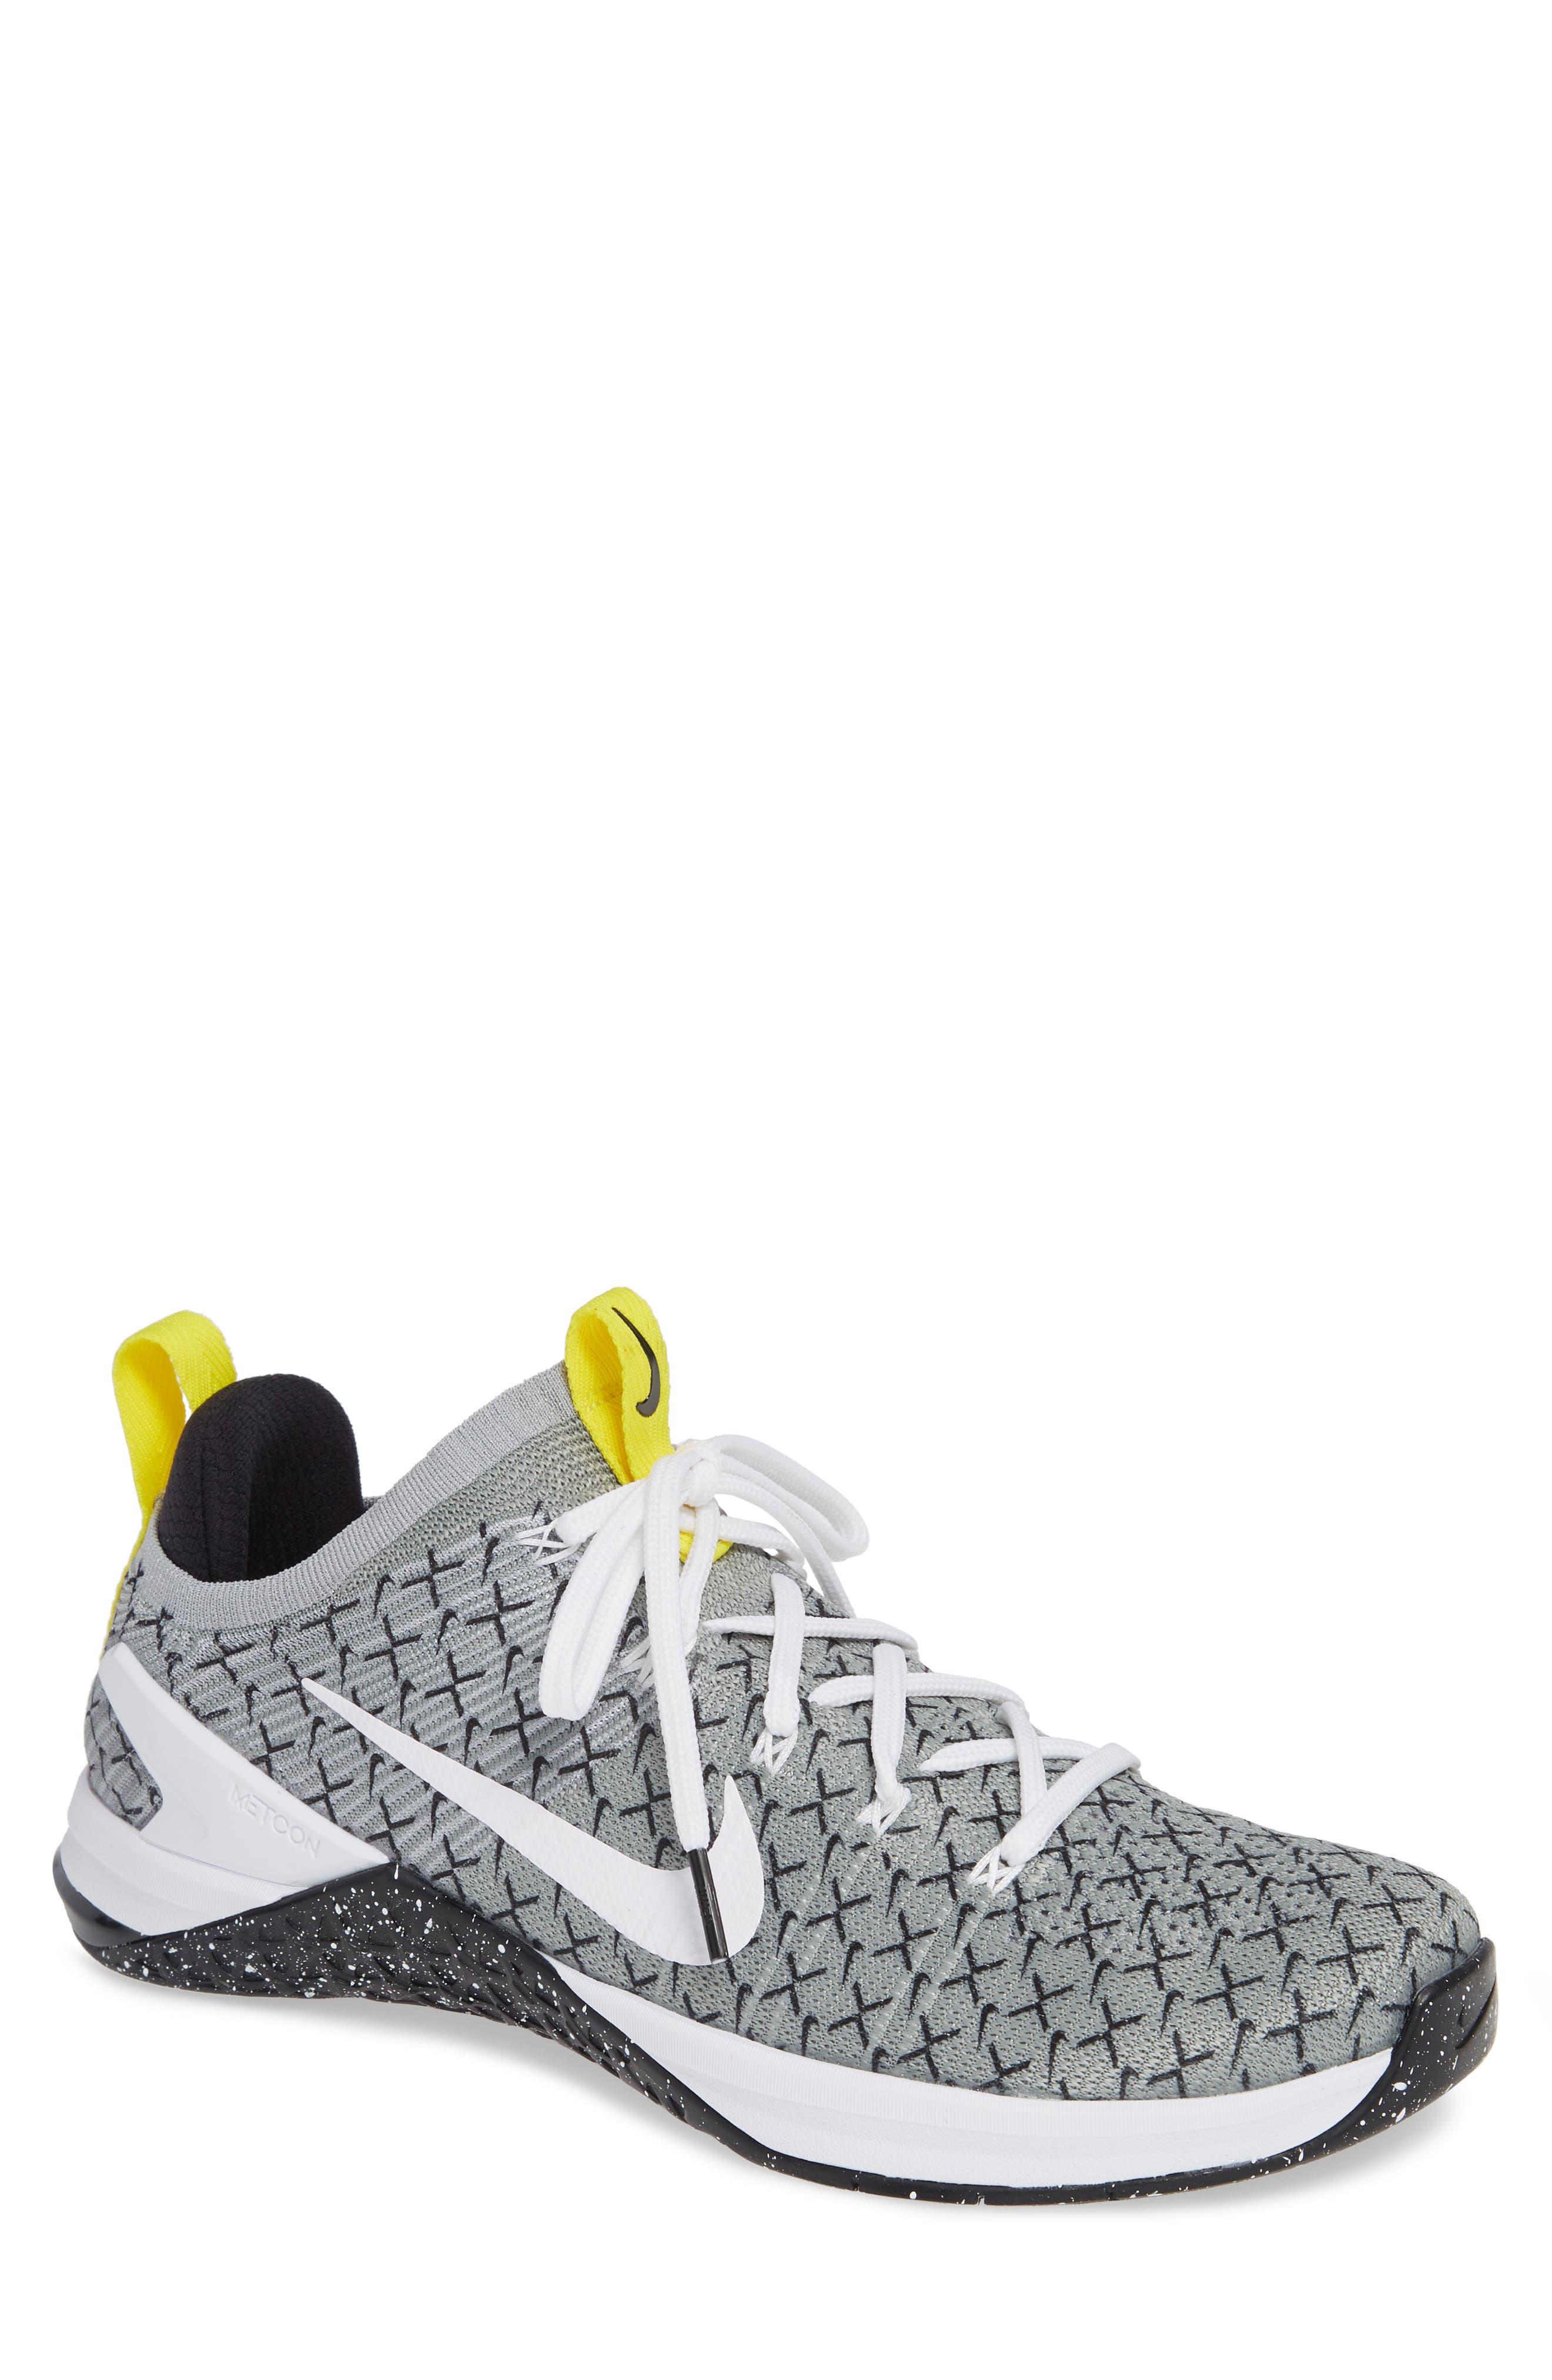 Metcon DSX Flyknit 2 Training Shoe,                             Main thumbnail 1, color,                             Black/ White/ Yellow